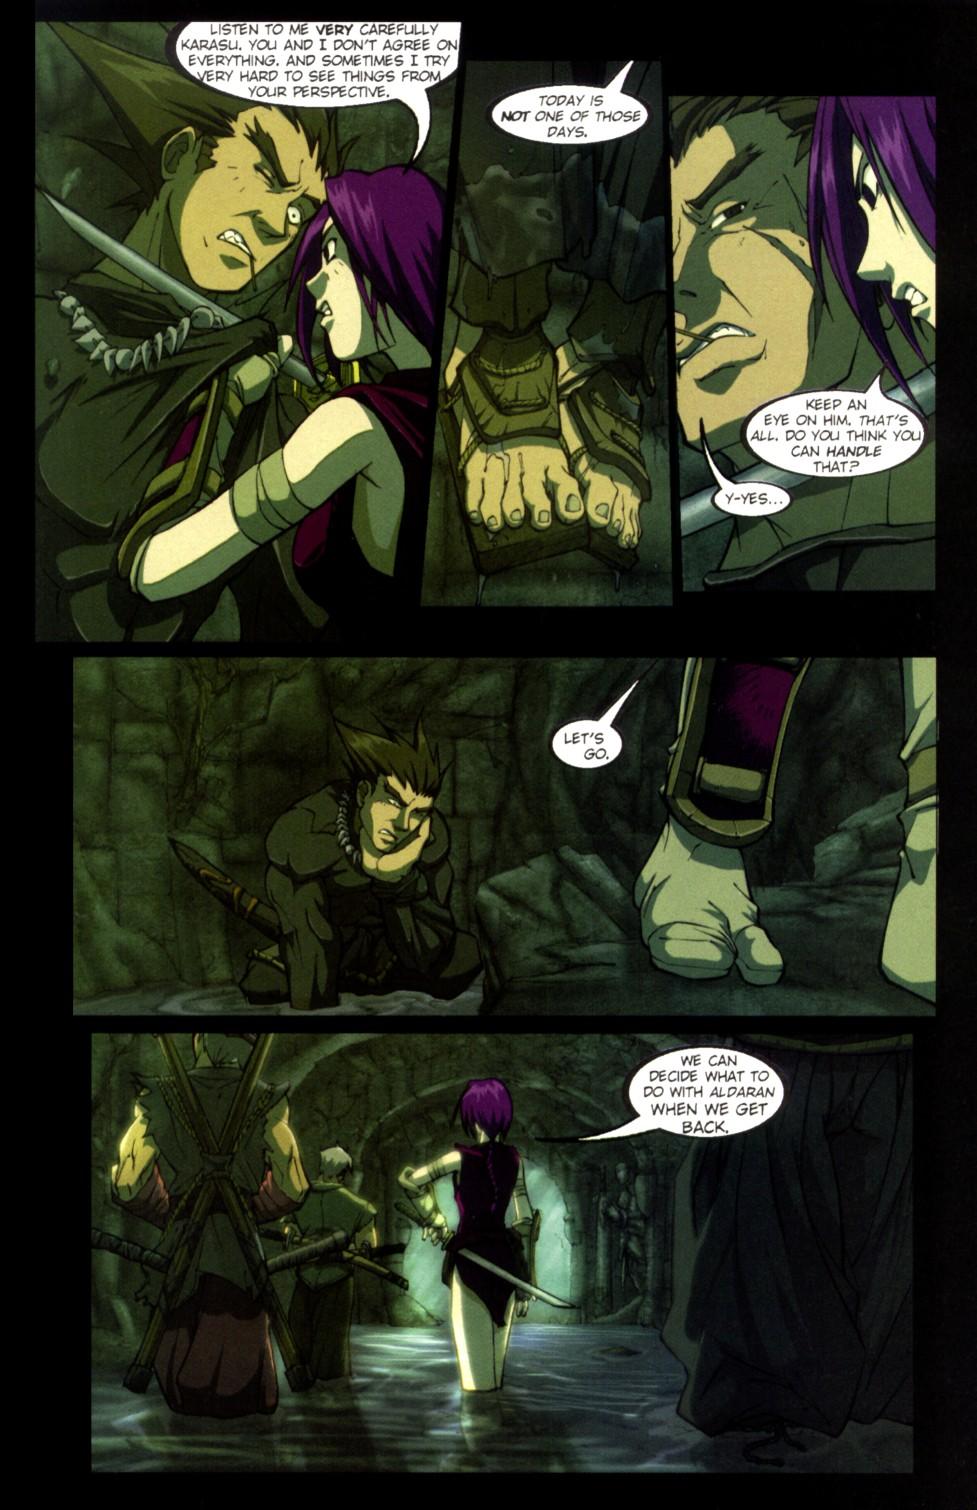 Read online Shidima comic -  Issue #3 - 13